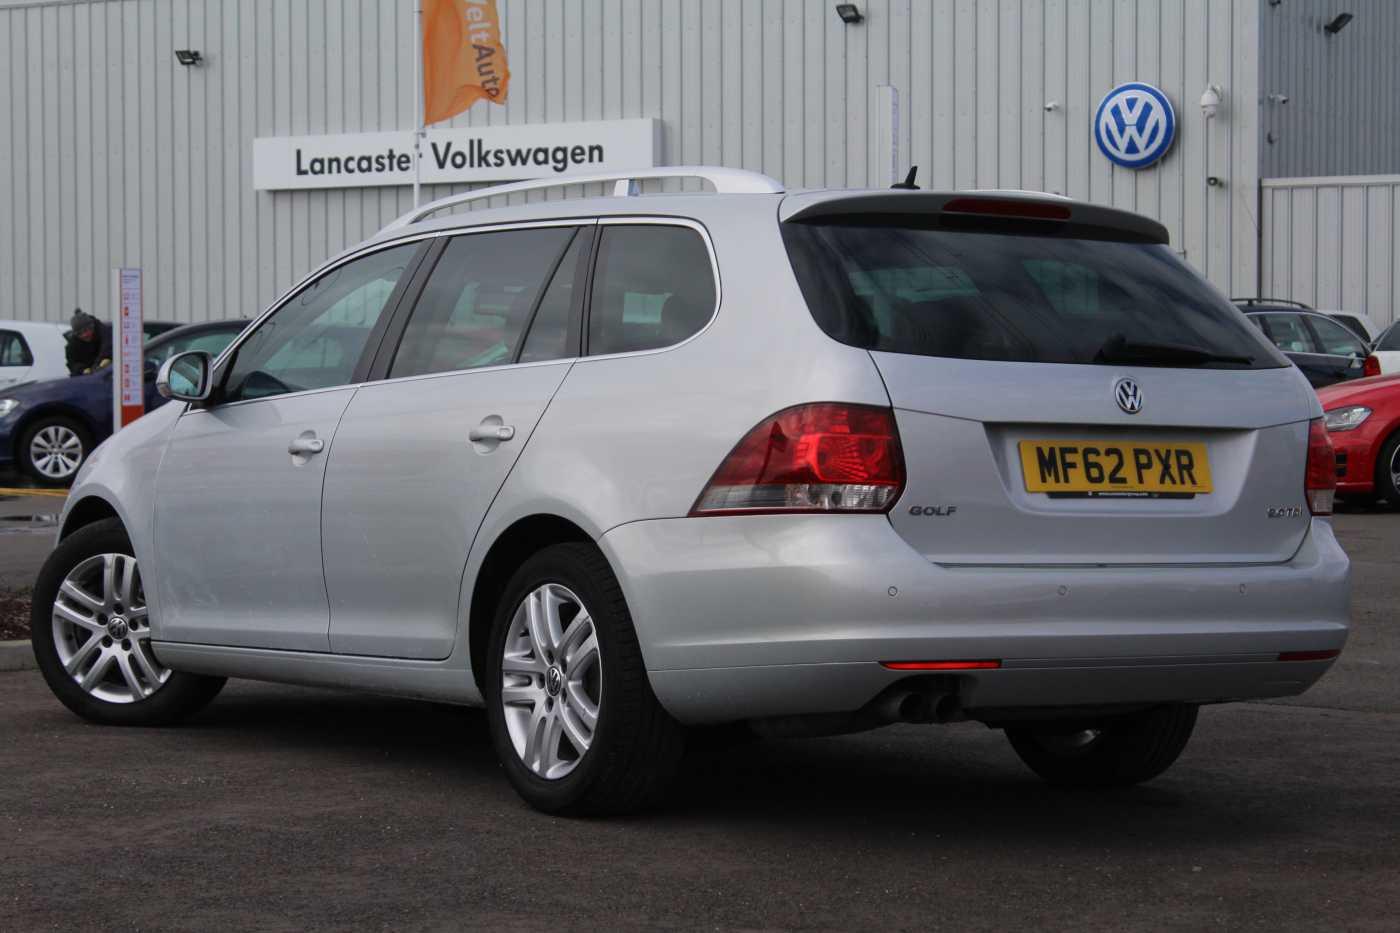 Volkswagen Golf 2.0 TDI SE 140PS DSG Estate